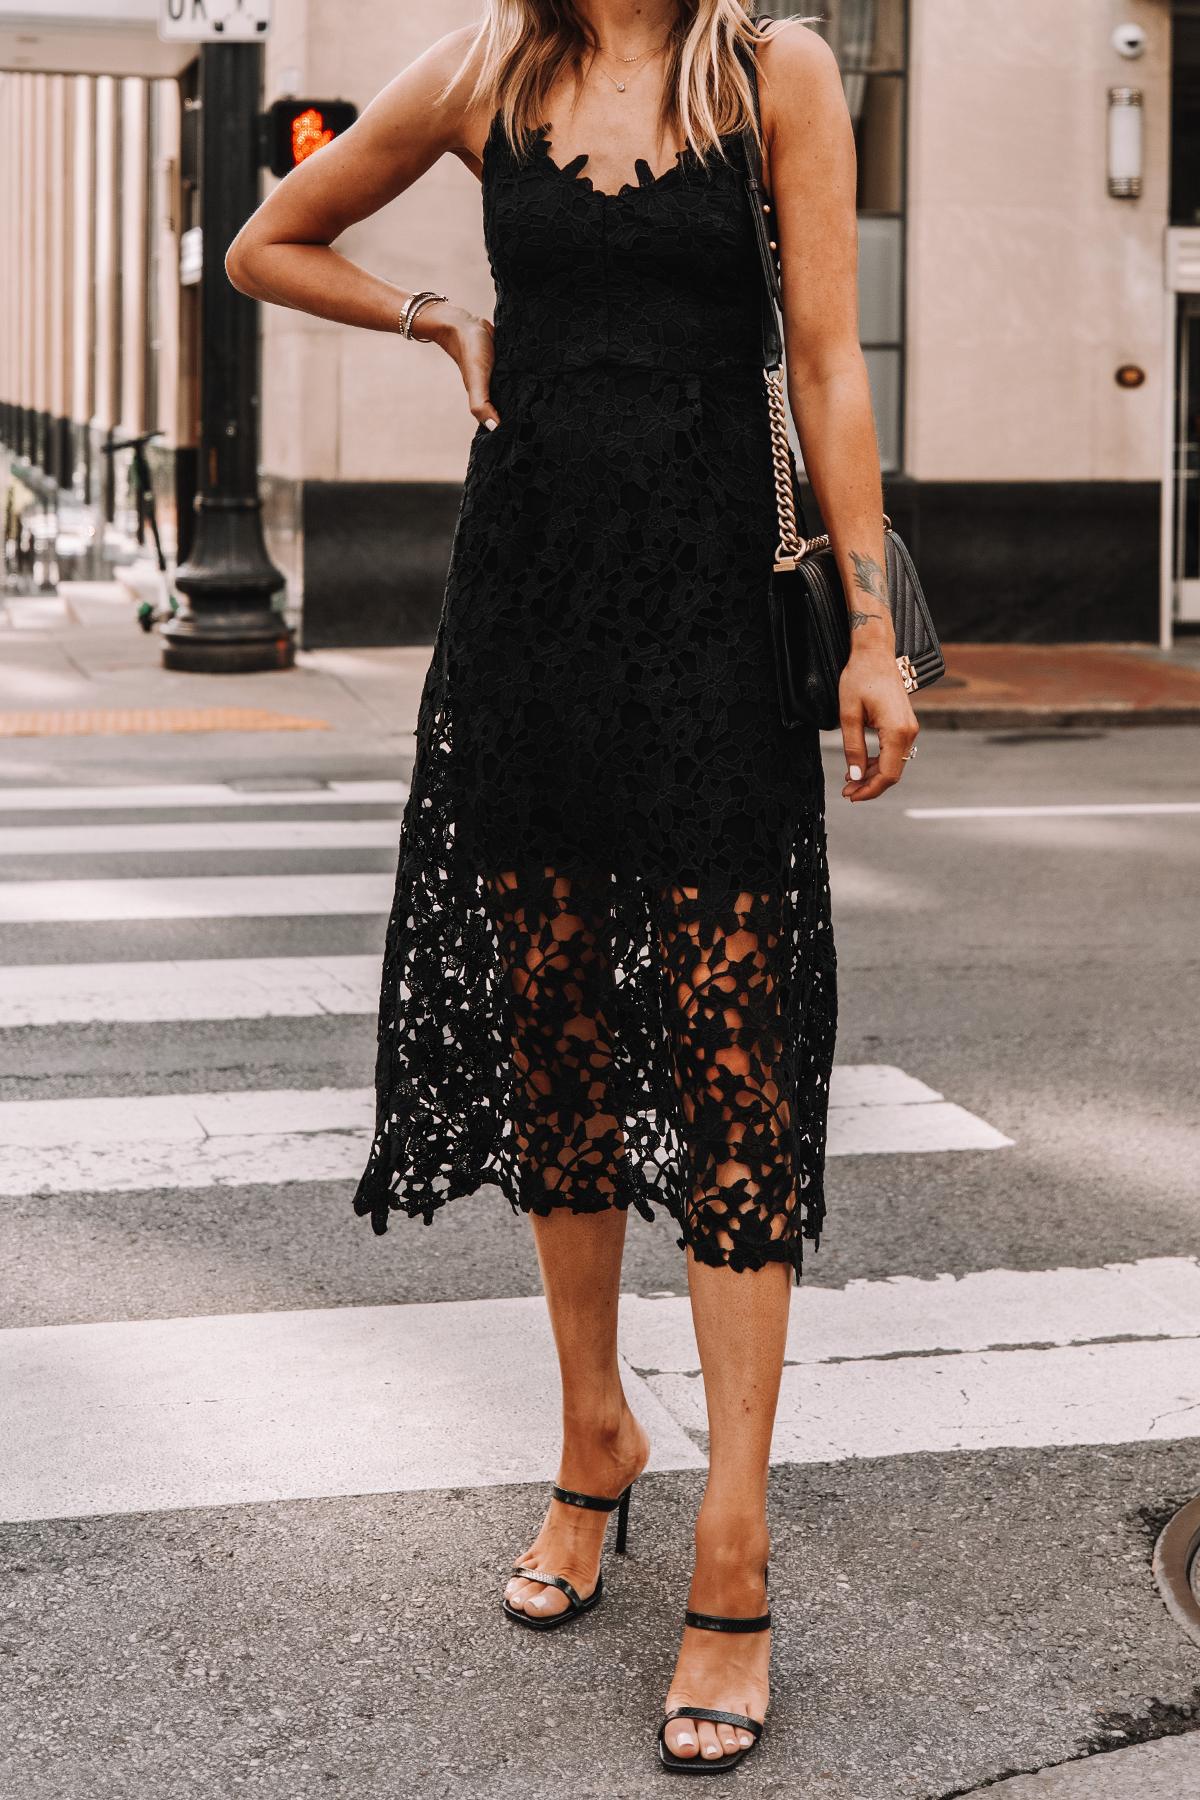 Fashion Jackson Wearing Black Lace Midi Dress Black Heeled Sandals Cocktail Dress 3